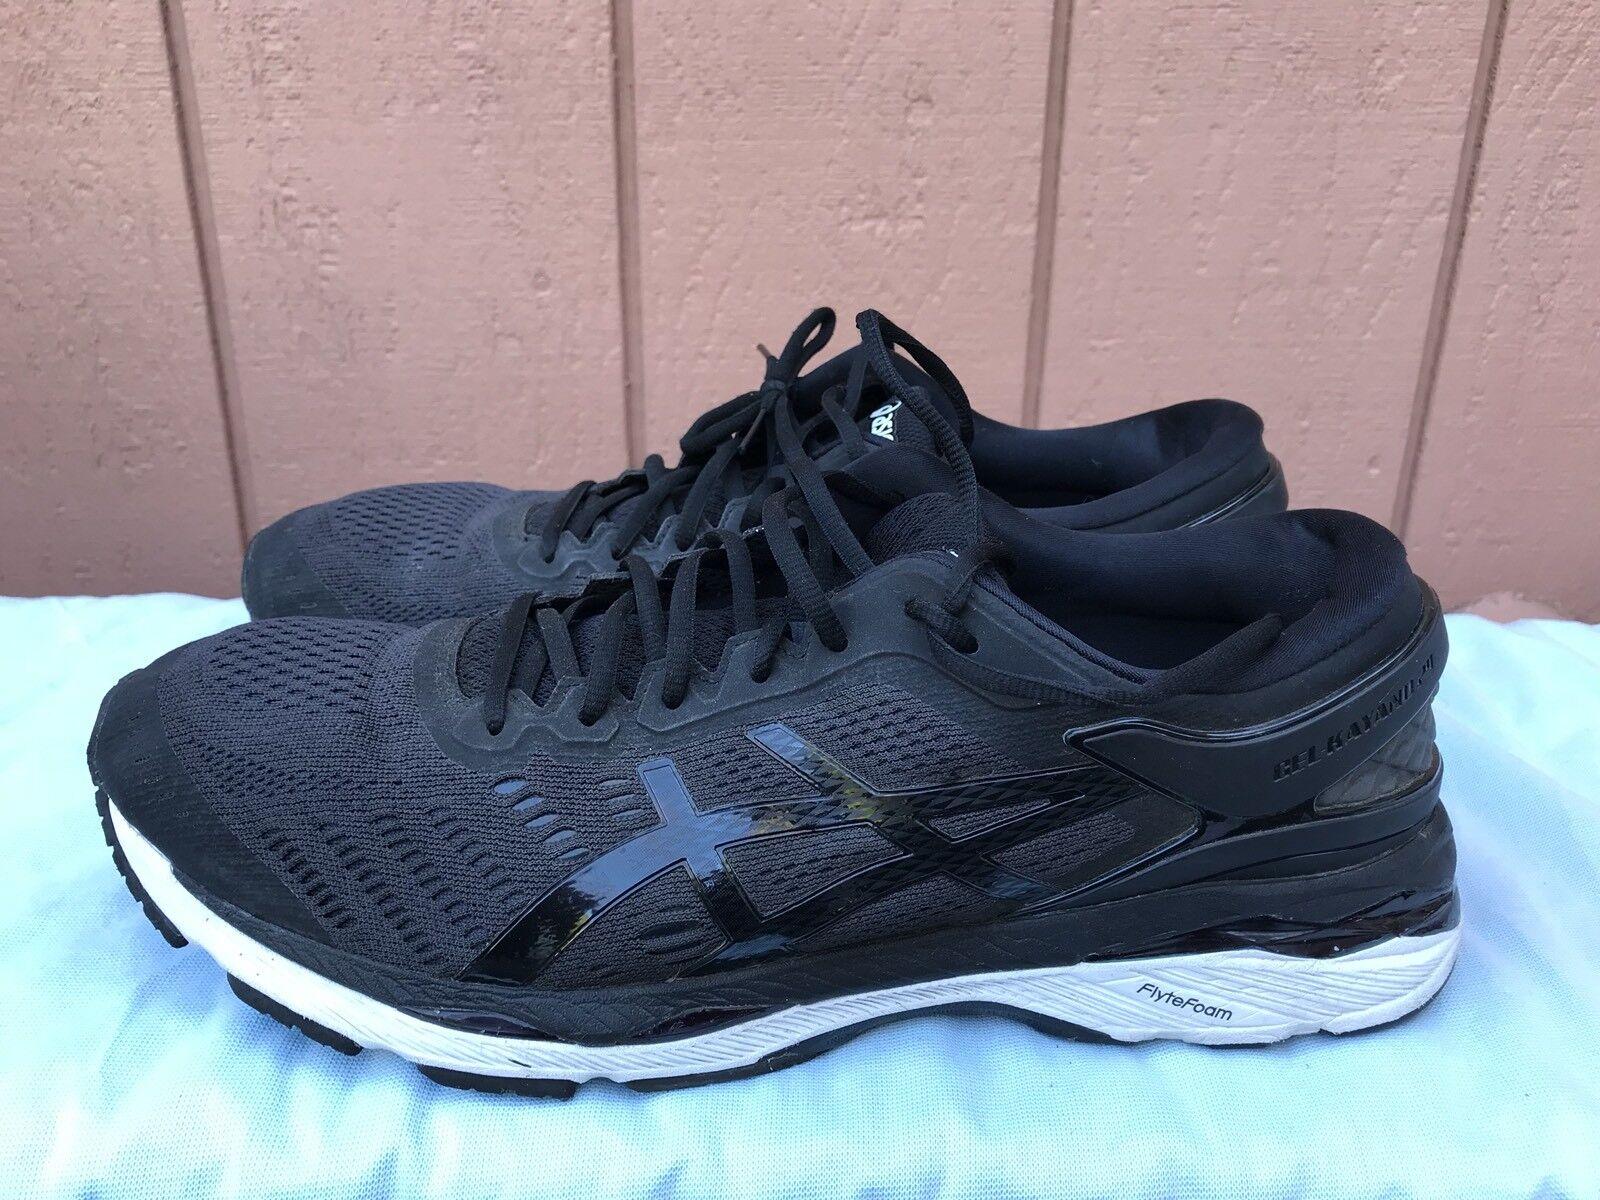 EUC Asics Mens Gel-Kayano 24 T749N.9016 Men's Size US 13 Black Running Shoes A3